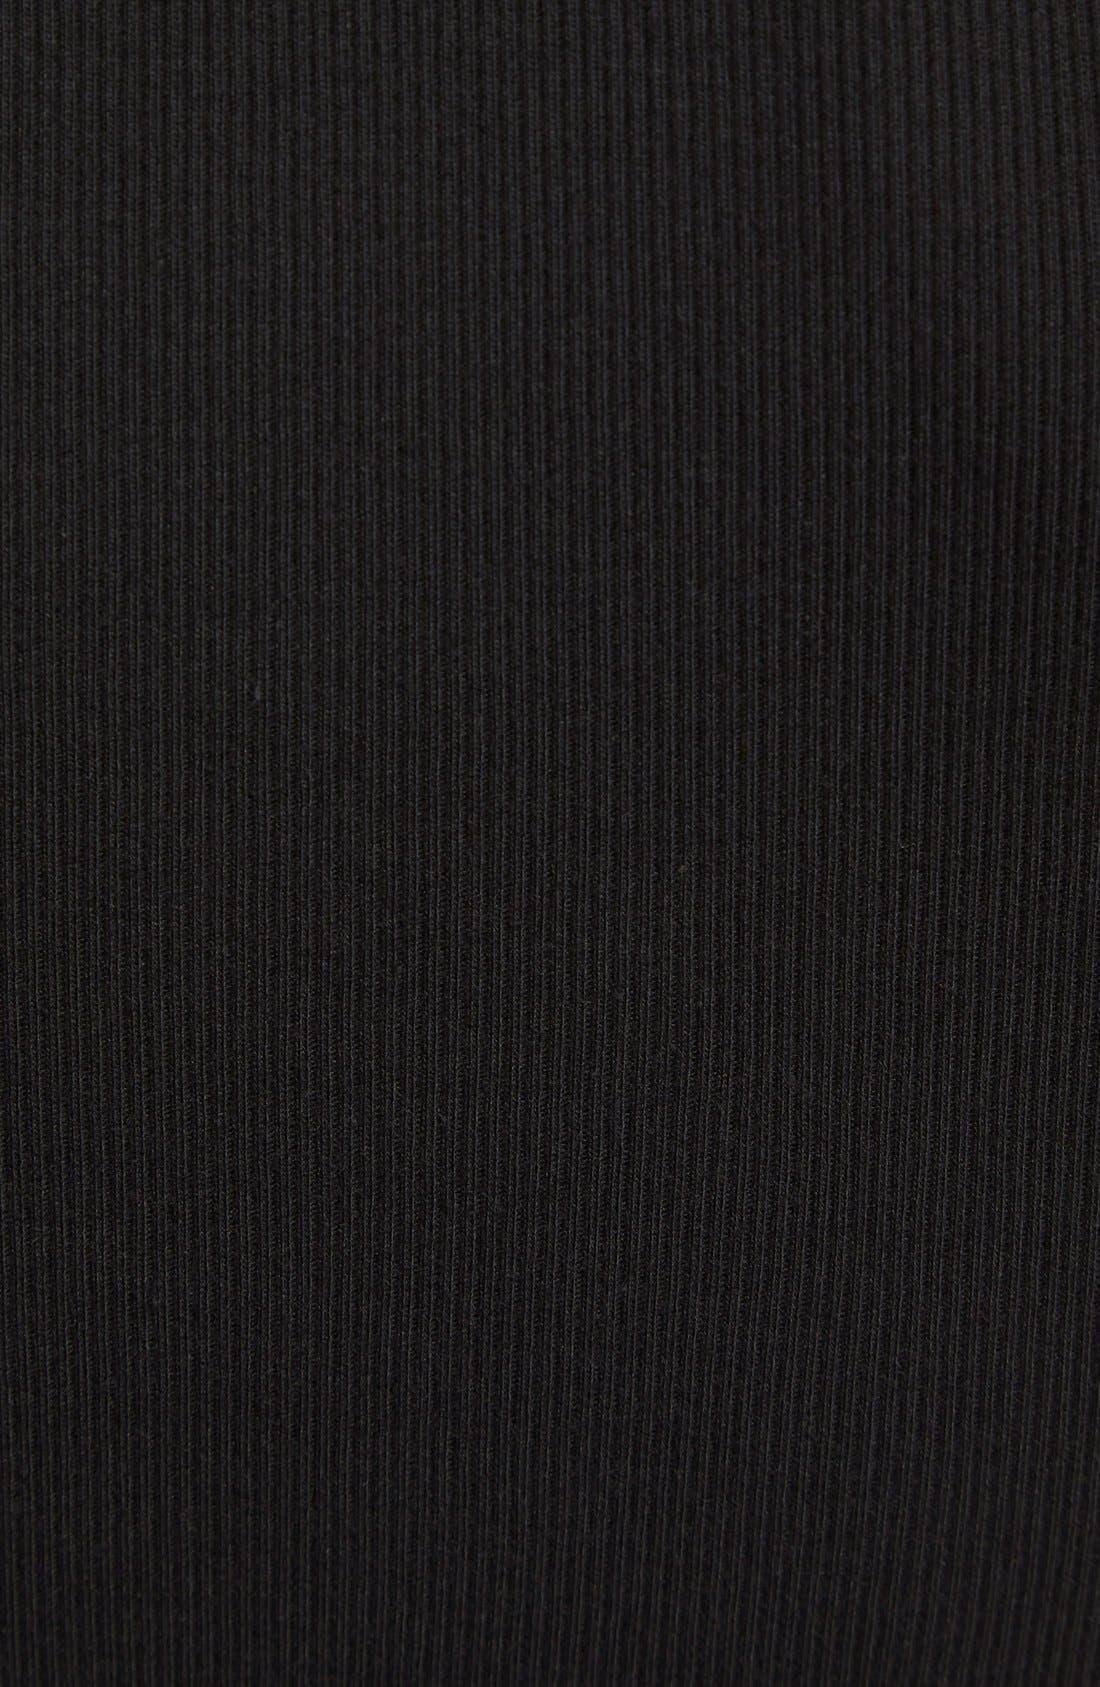 CALVIN KLEIN, Classic Fit 3-Pack Cotton Tank Top, Alternate thumbnail 3, color, Black